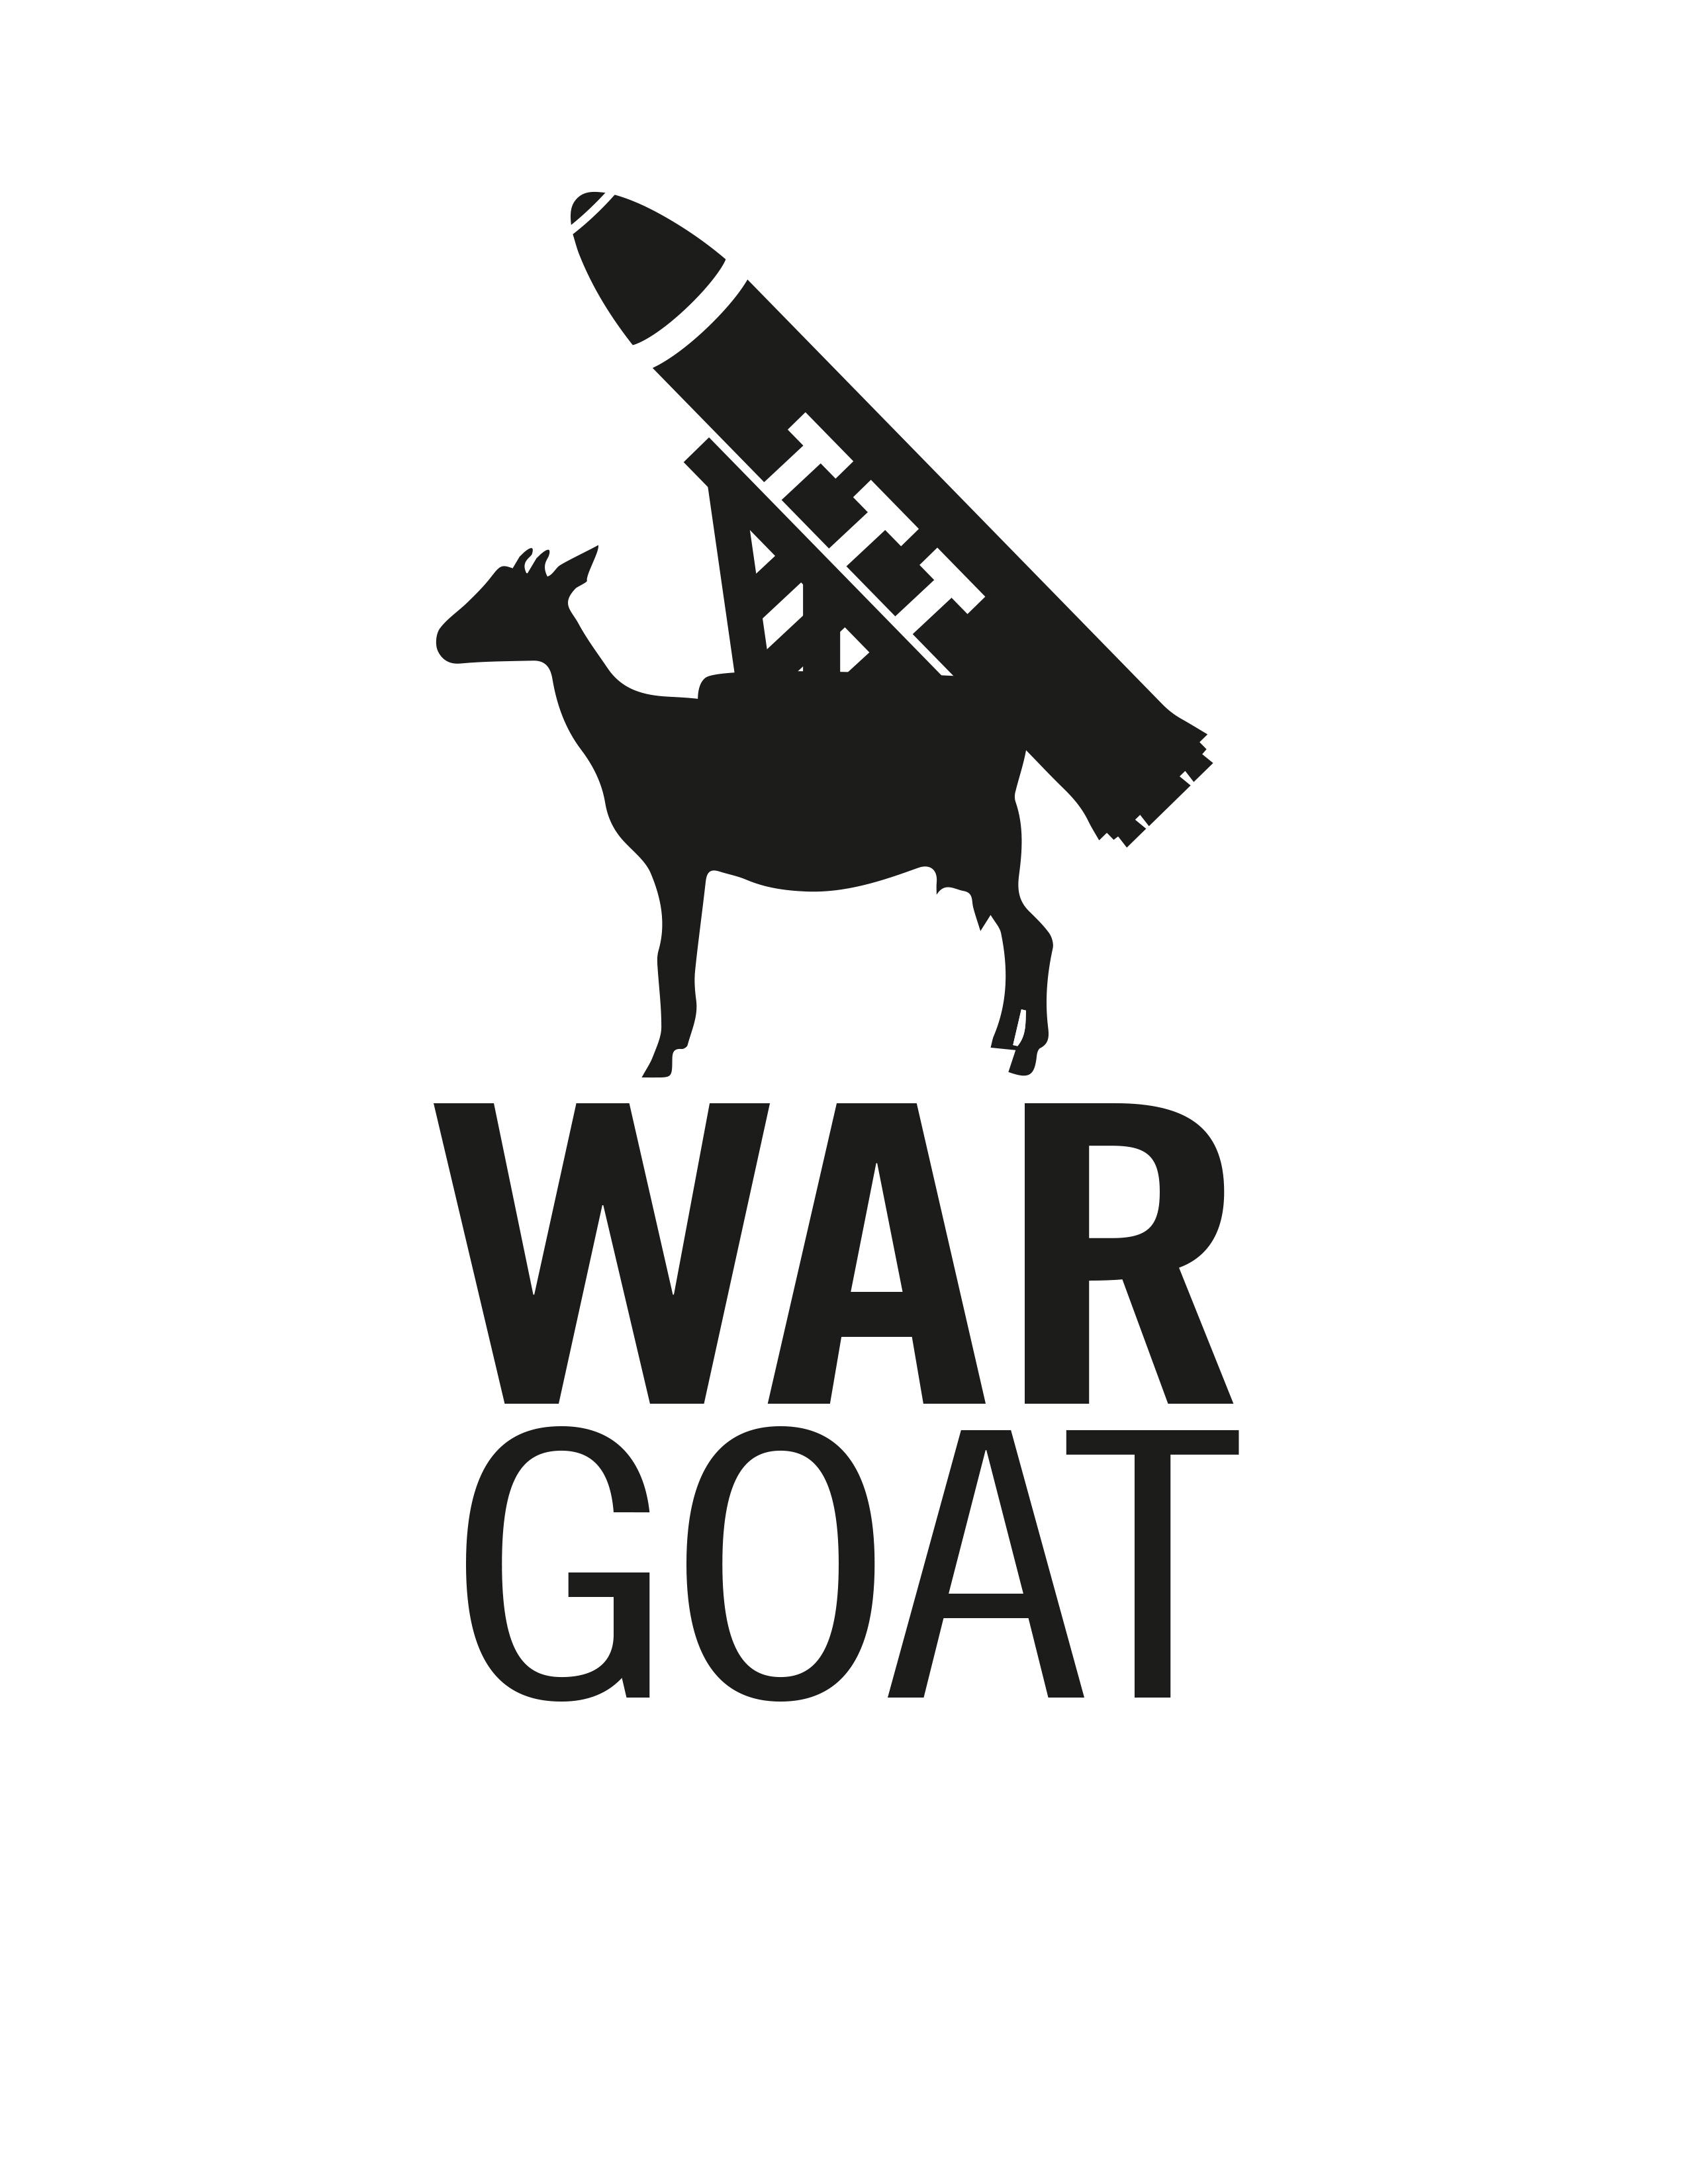 war goat logo2 copy